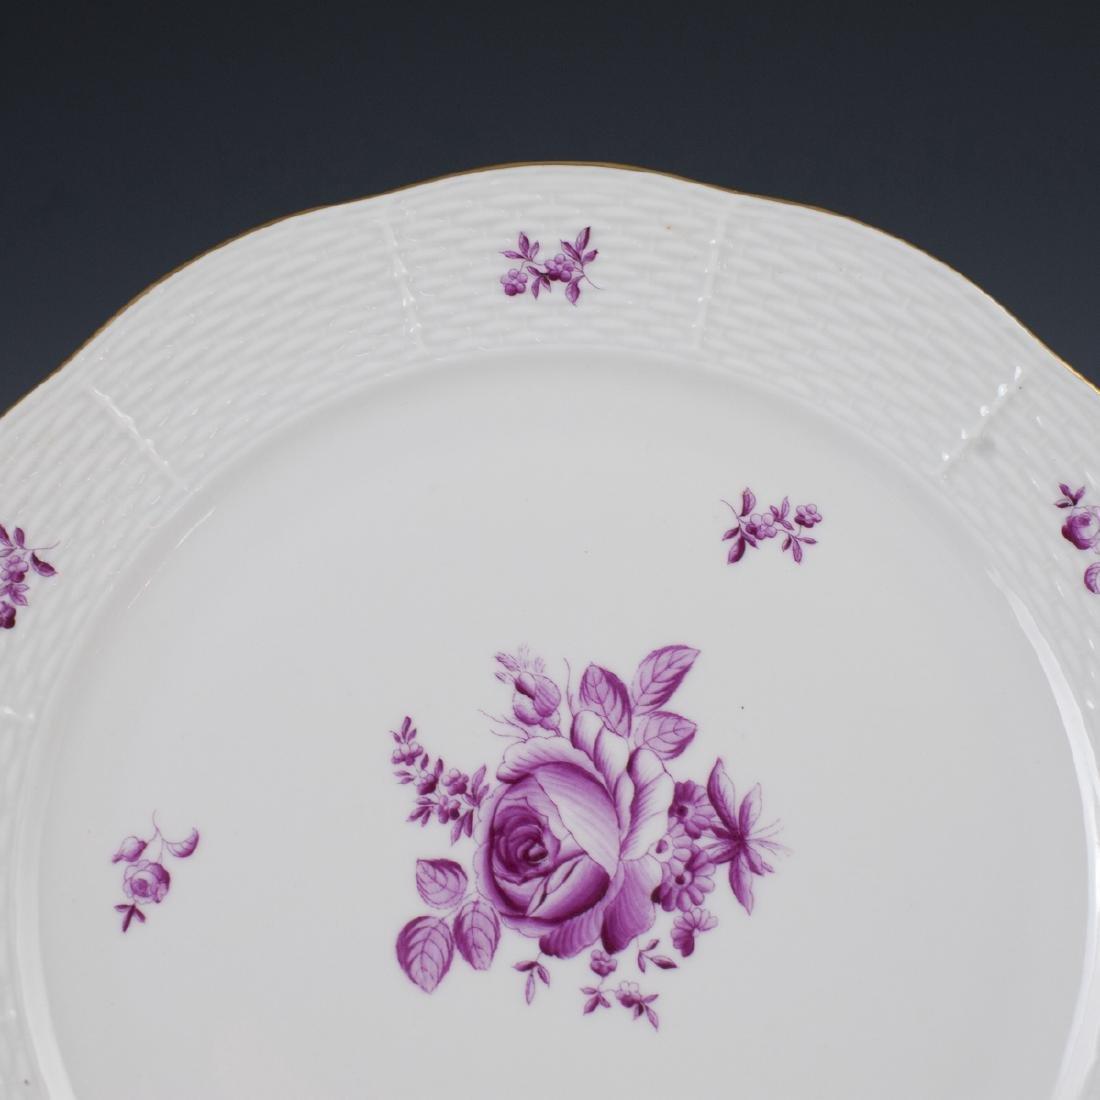 Herend Porcelain Dinner Plates - 2